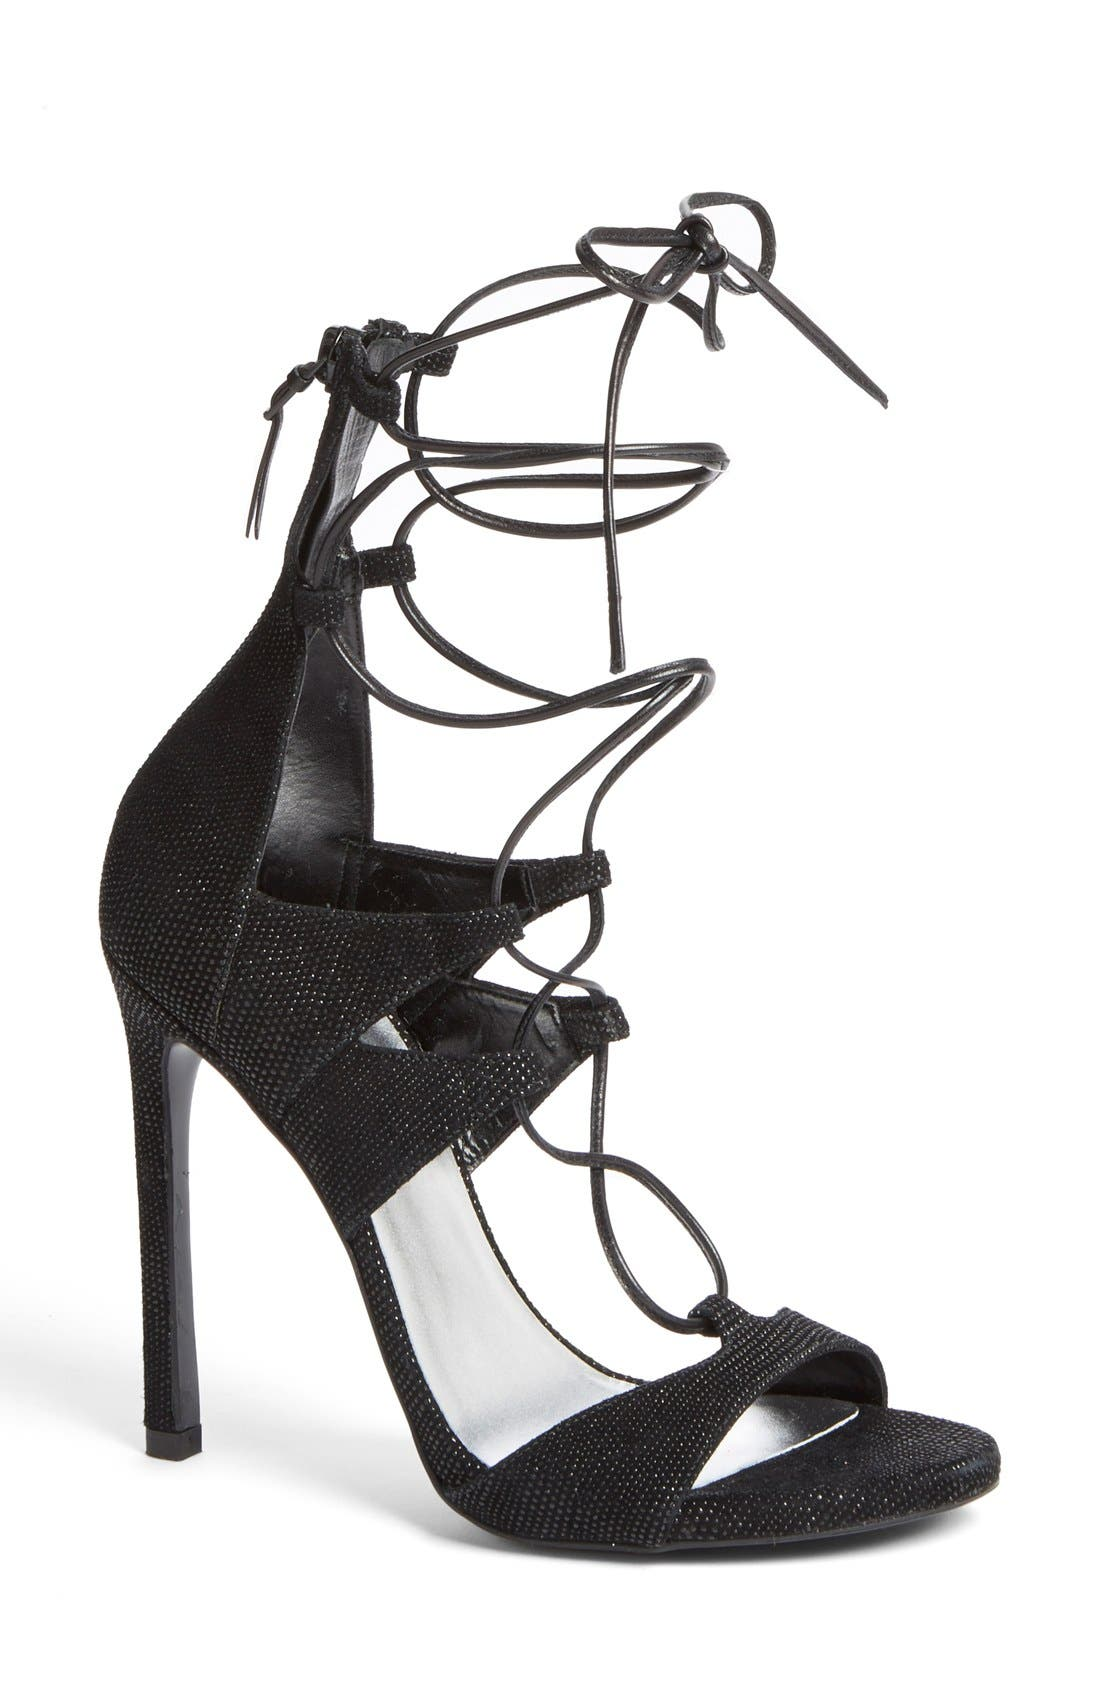 Main Image - Stuart Weitzman Leg Wrap High Dress Sandal (Women)